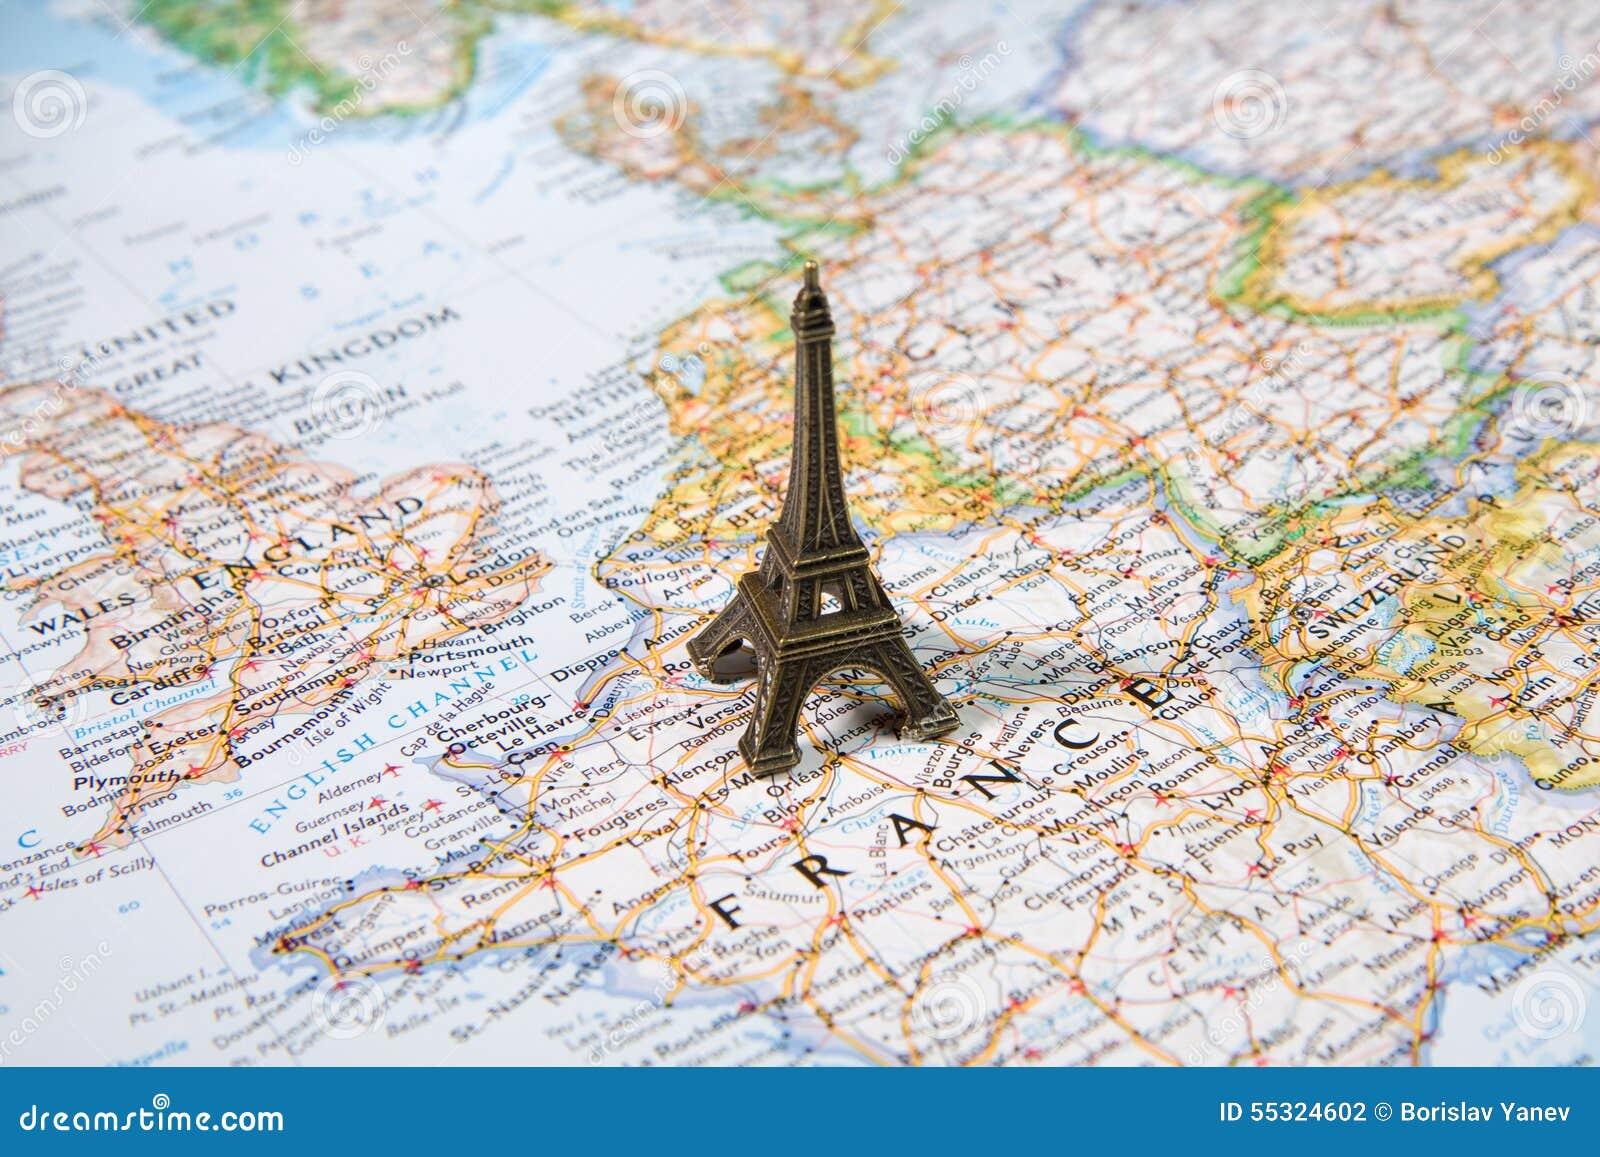 Statue Of Eiffel Tower On A Map, Paris Most Romantic Tourist ...